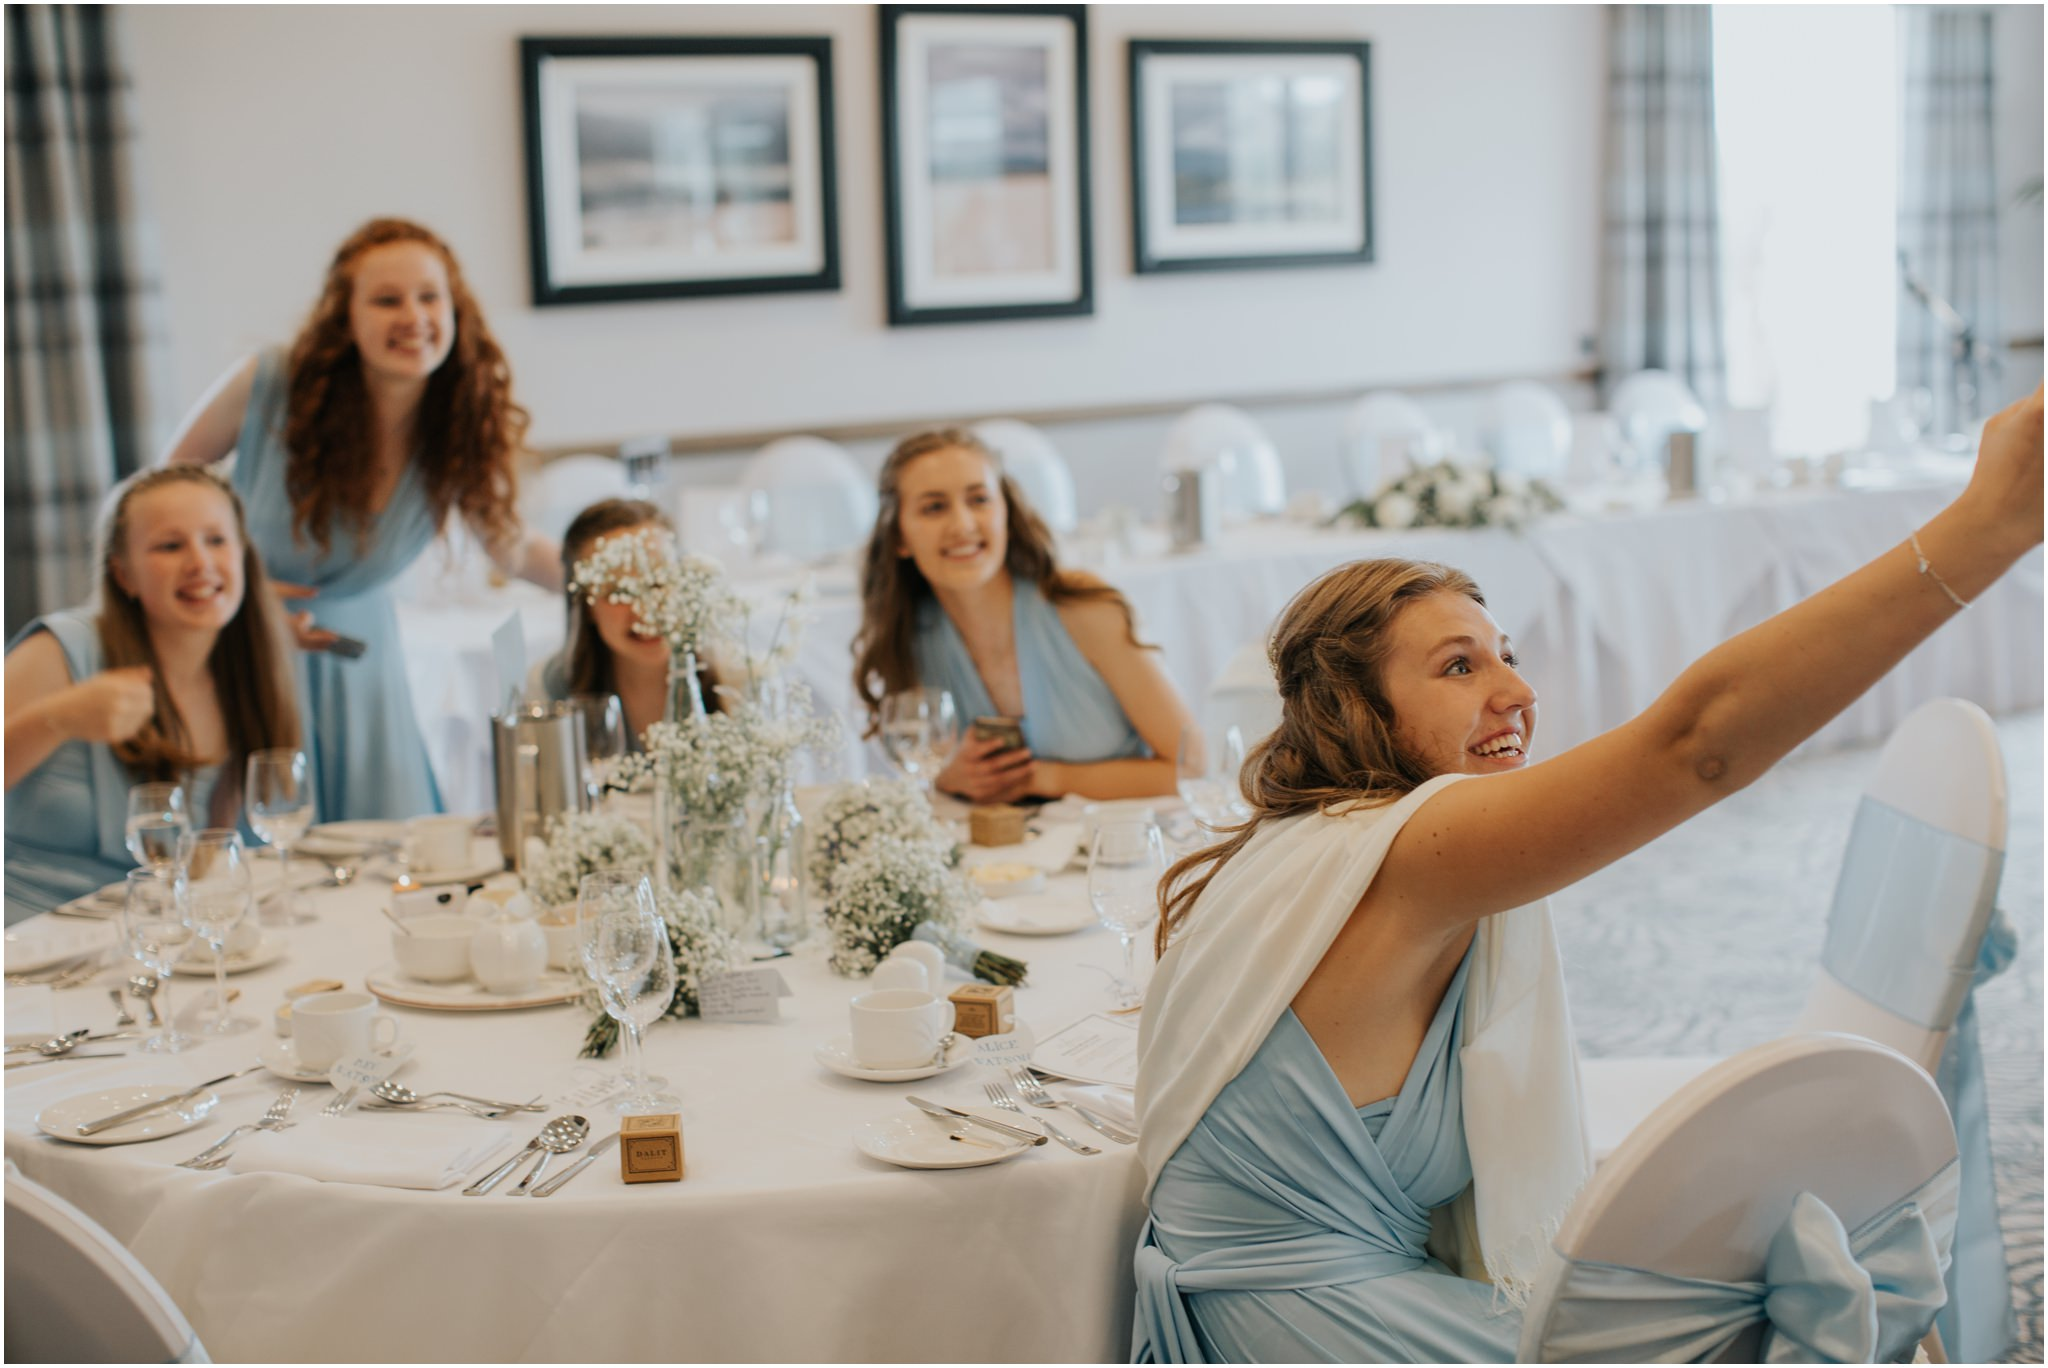 Photography 78 - Glasgow Wedding Photographer - Jordan & Abi - The Waterside Hotel, West Kilbride_0100.jpg